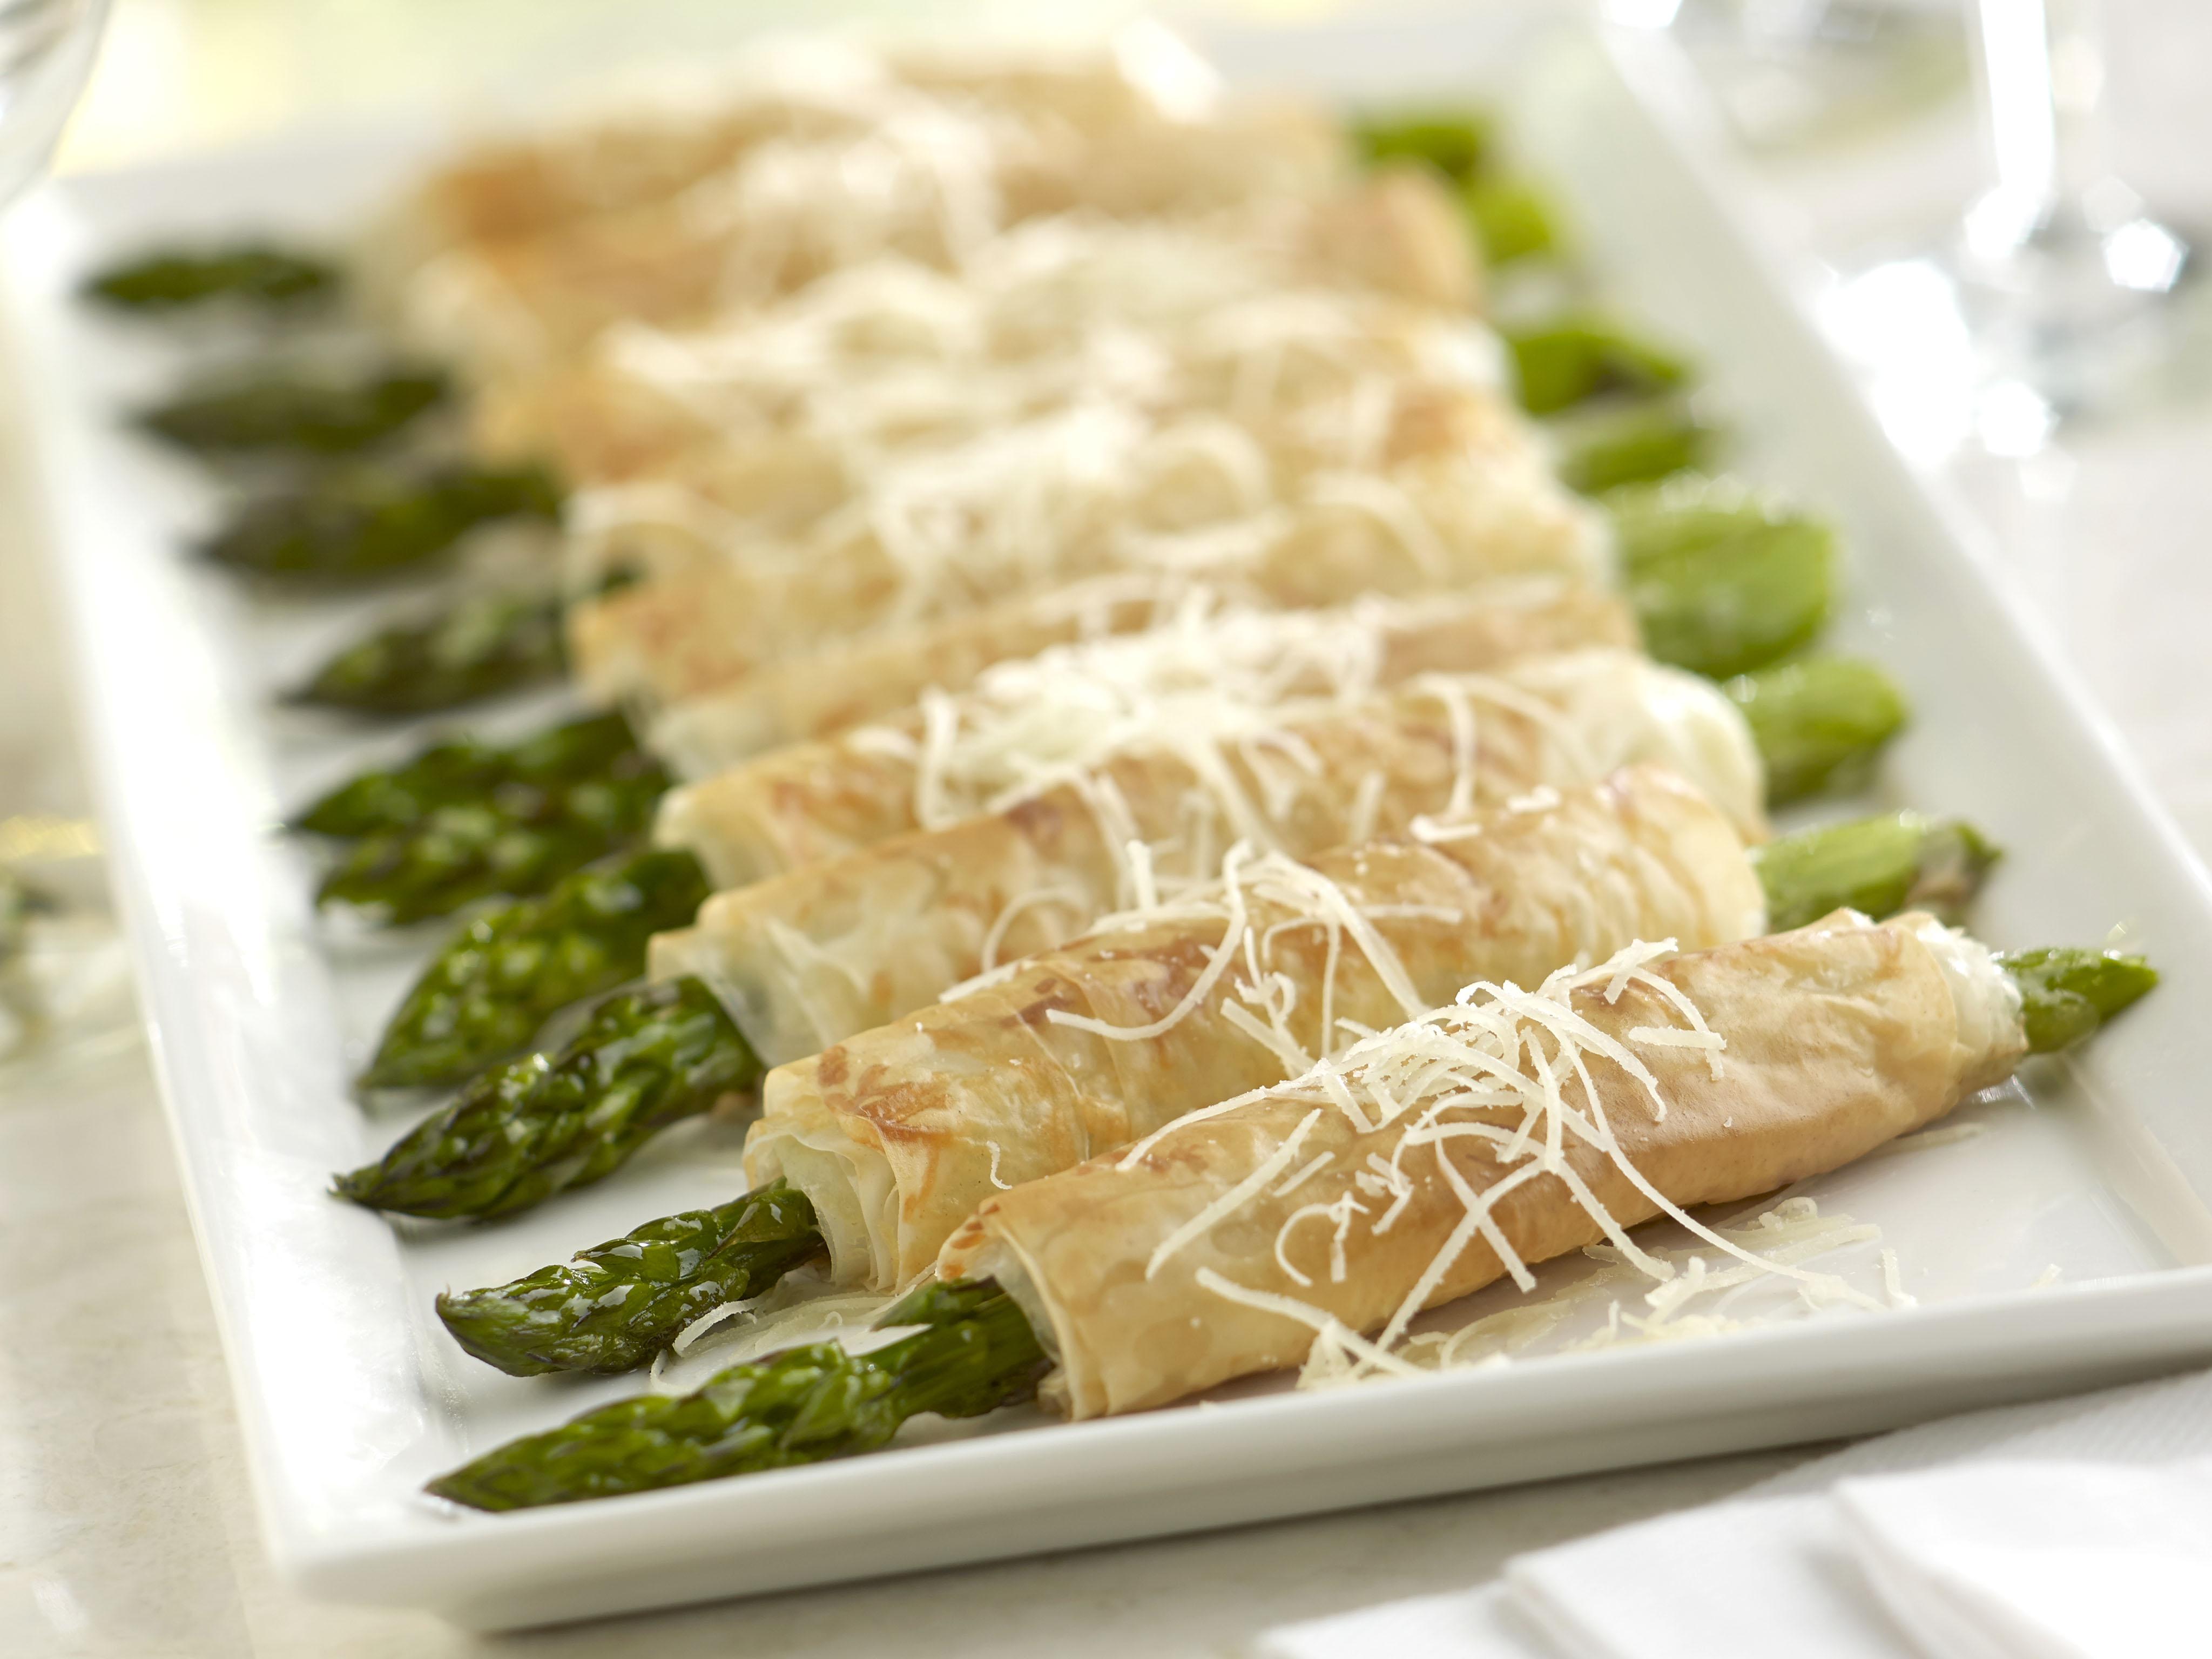 BelGioioso Asparagus Appetizers